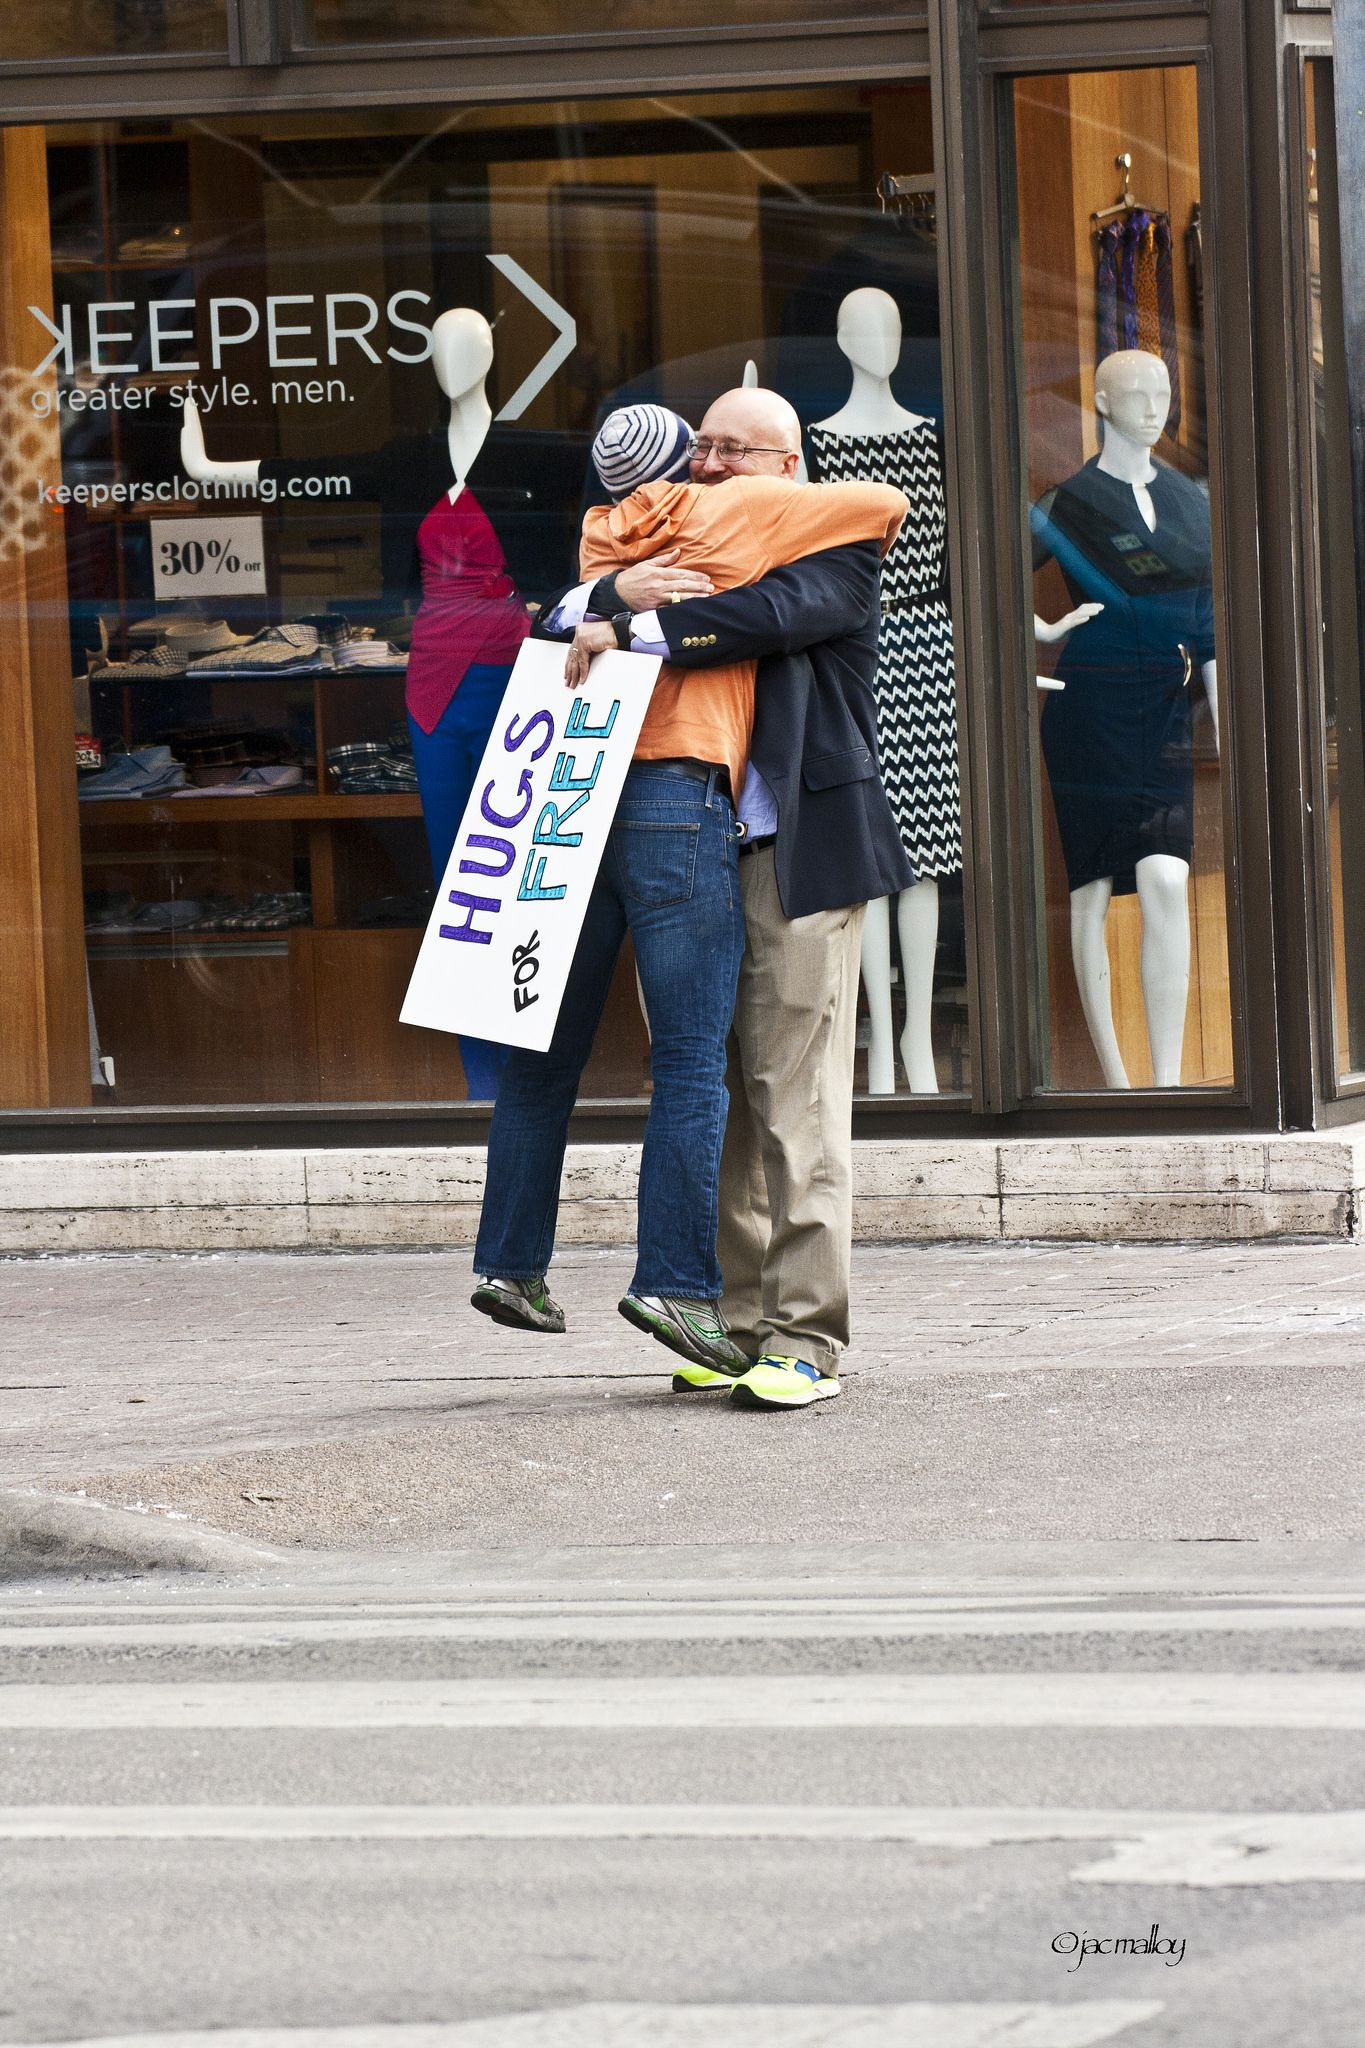 Fh_9 free hugs austin texas